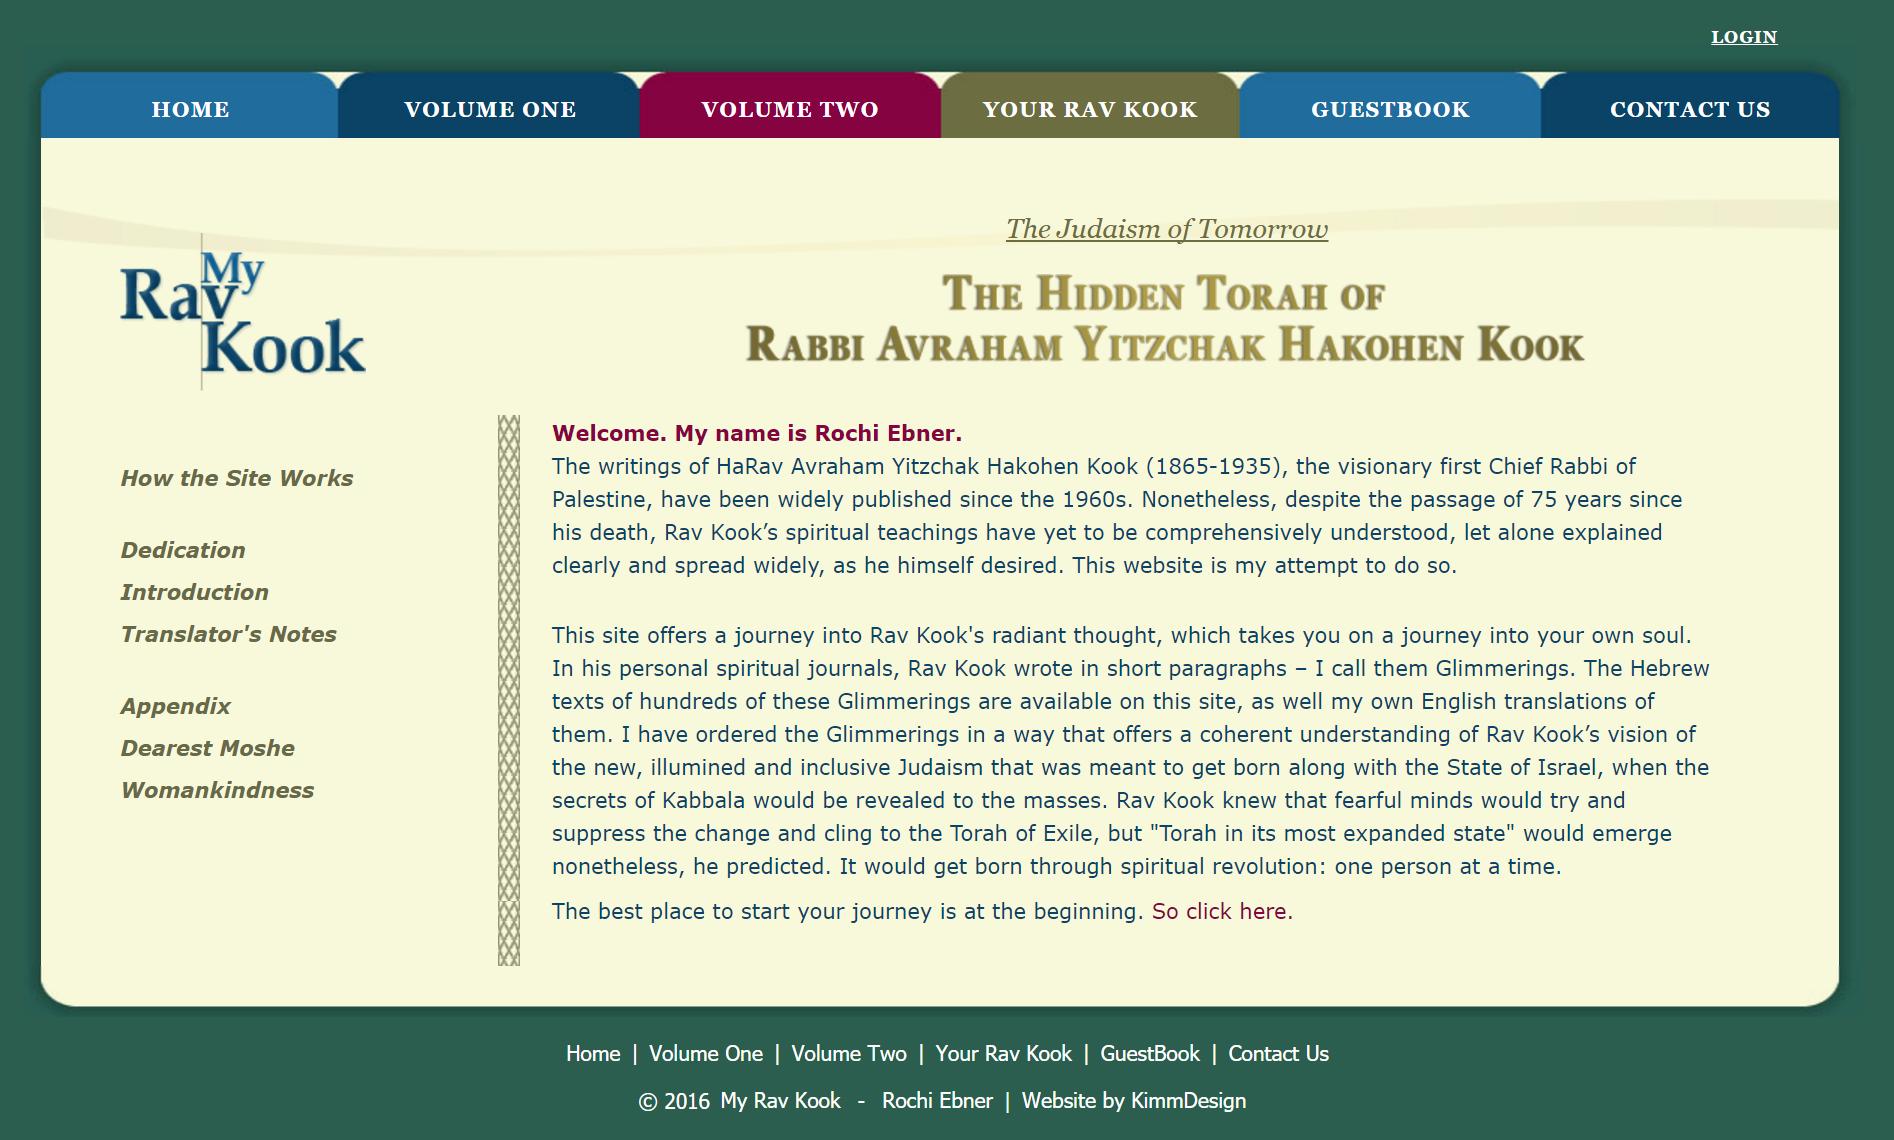 My Rav Kook home page image